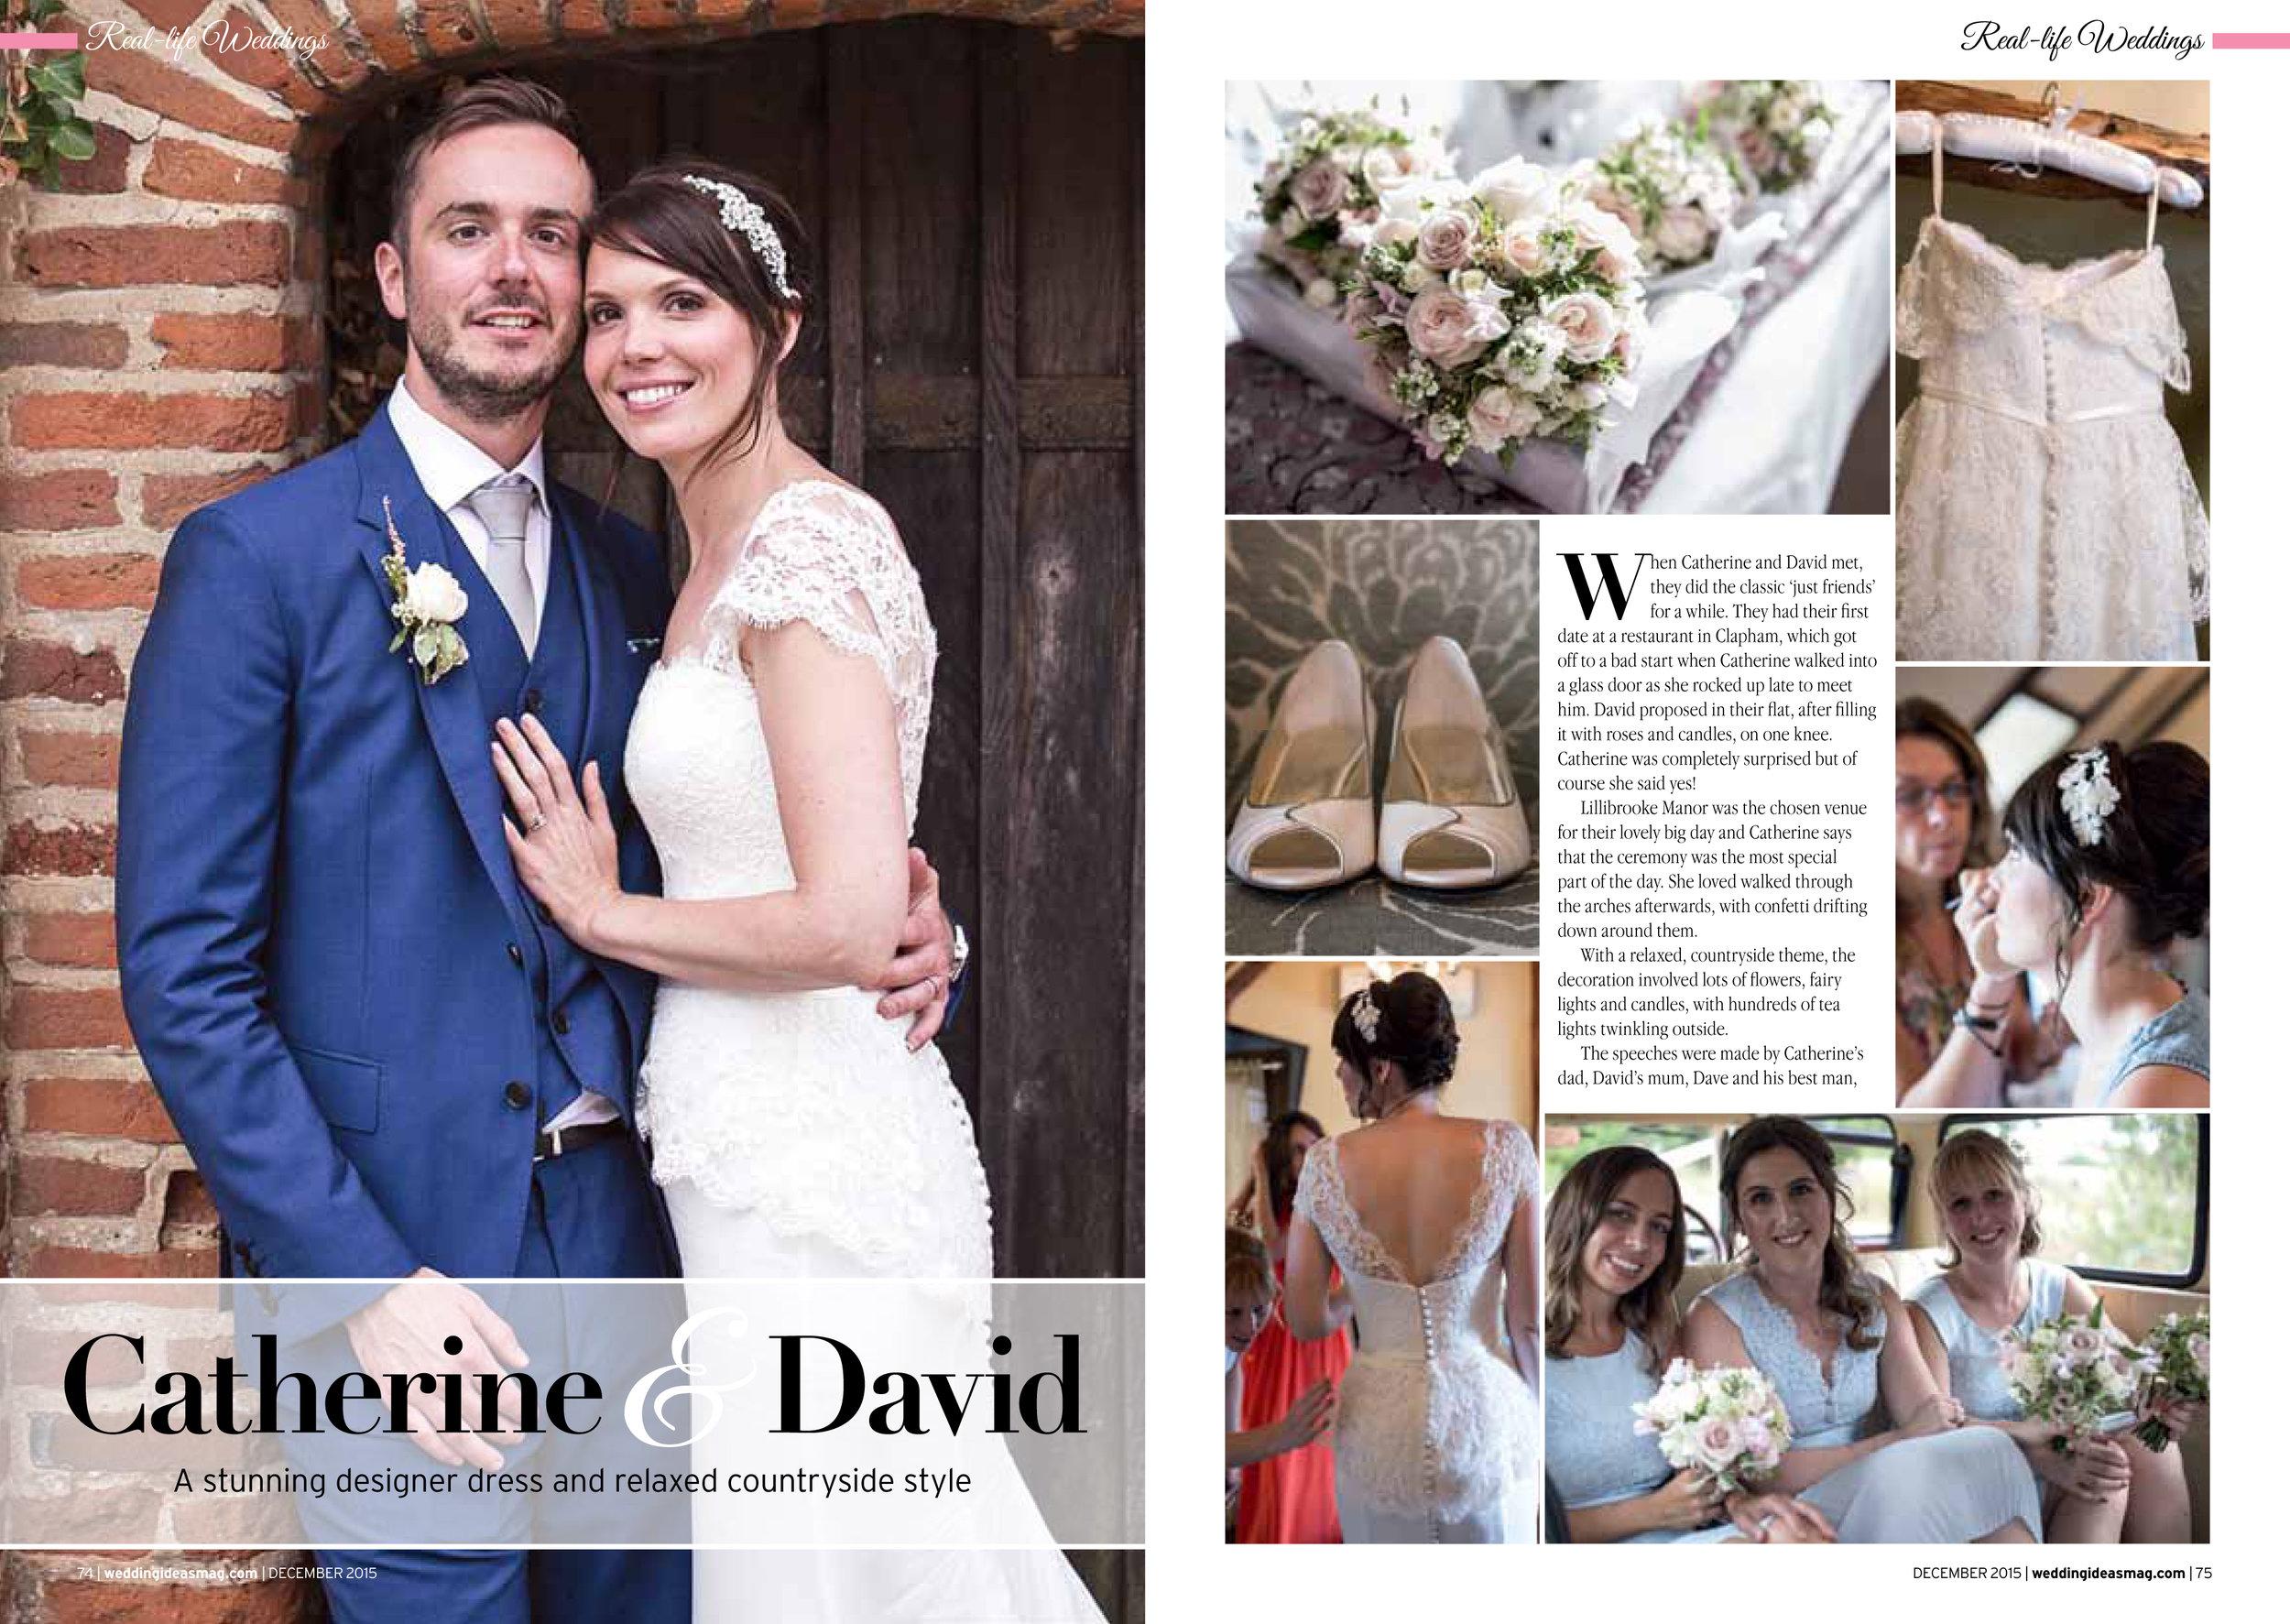 Catherine&David-1.jpg